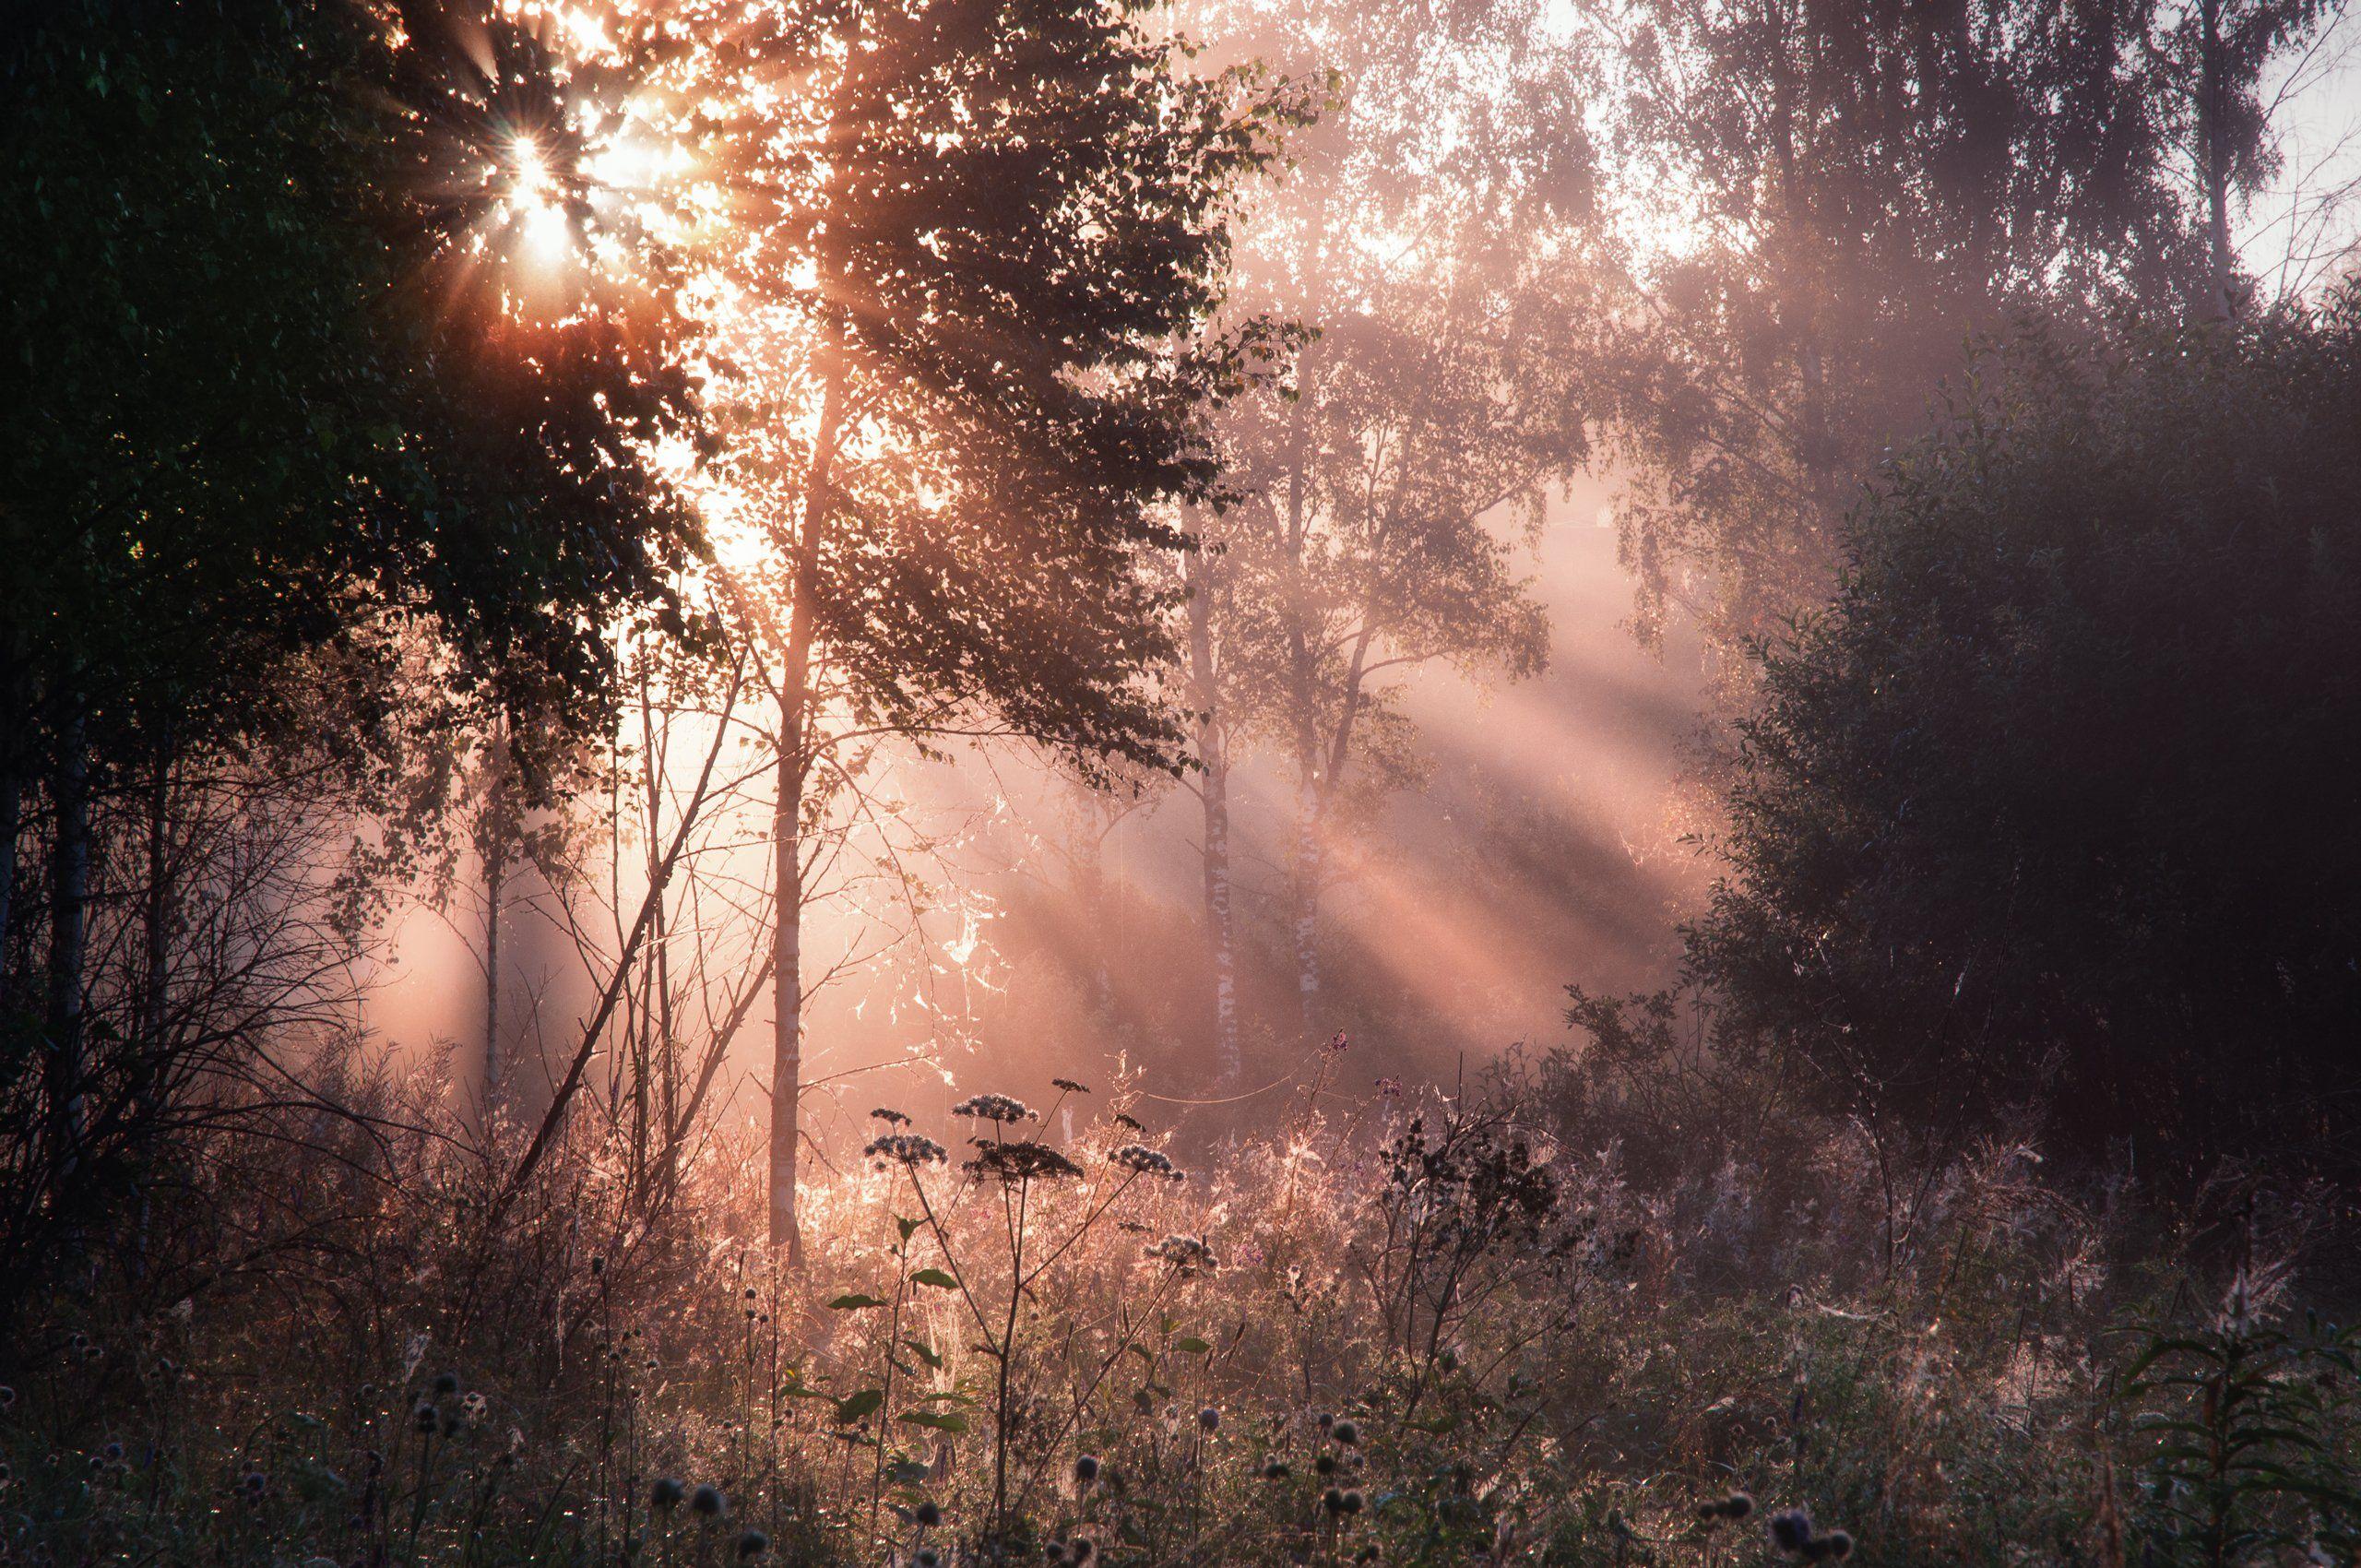 природа, рассвет, туман, солнце, туман, пейзаж, nature, dawn, fog, sun, fog, landscape, Алексей Сергованцев